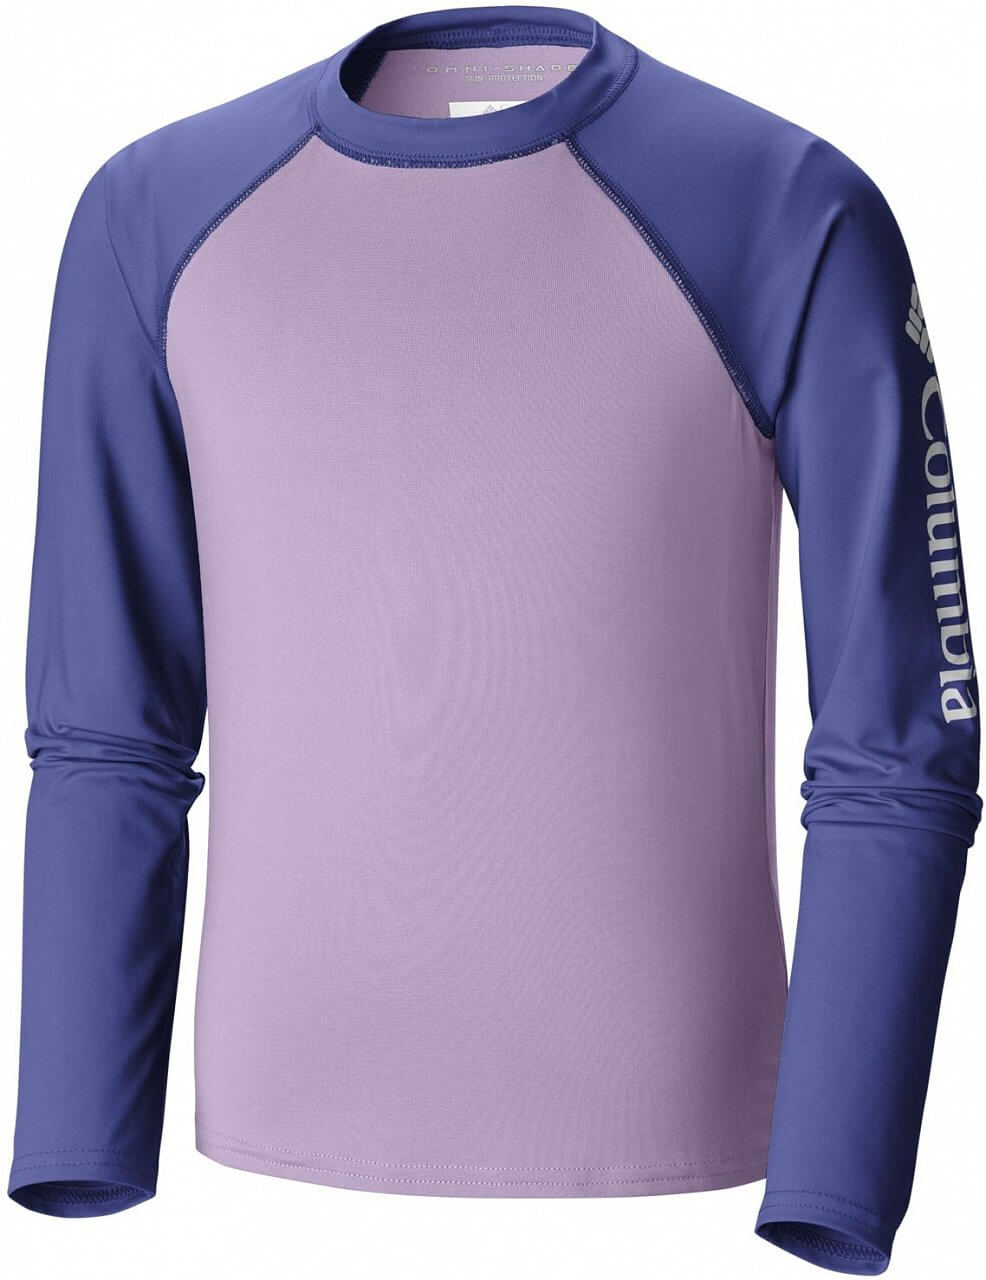 Dětské tričko Columbia Mini Breaker Long Sleeve Sunguard